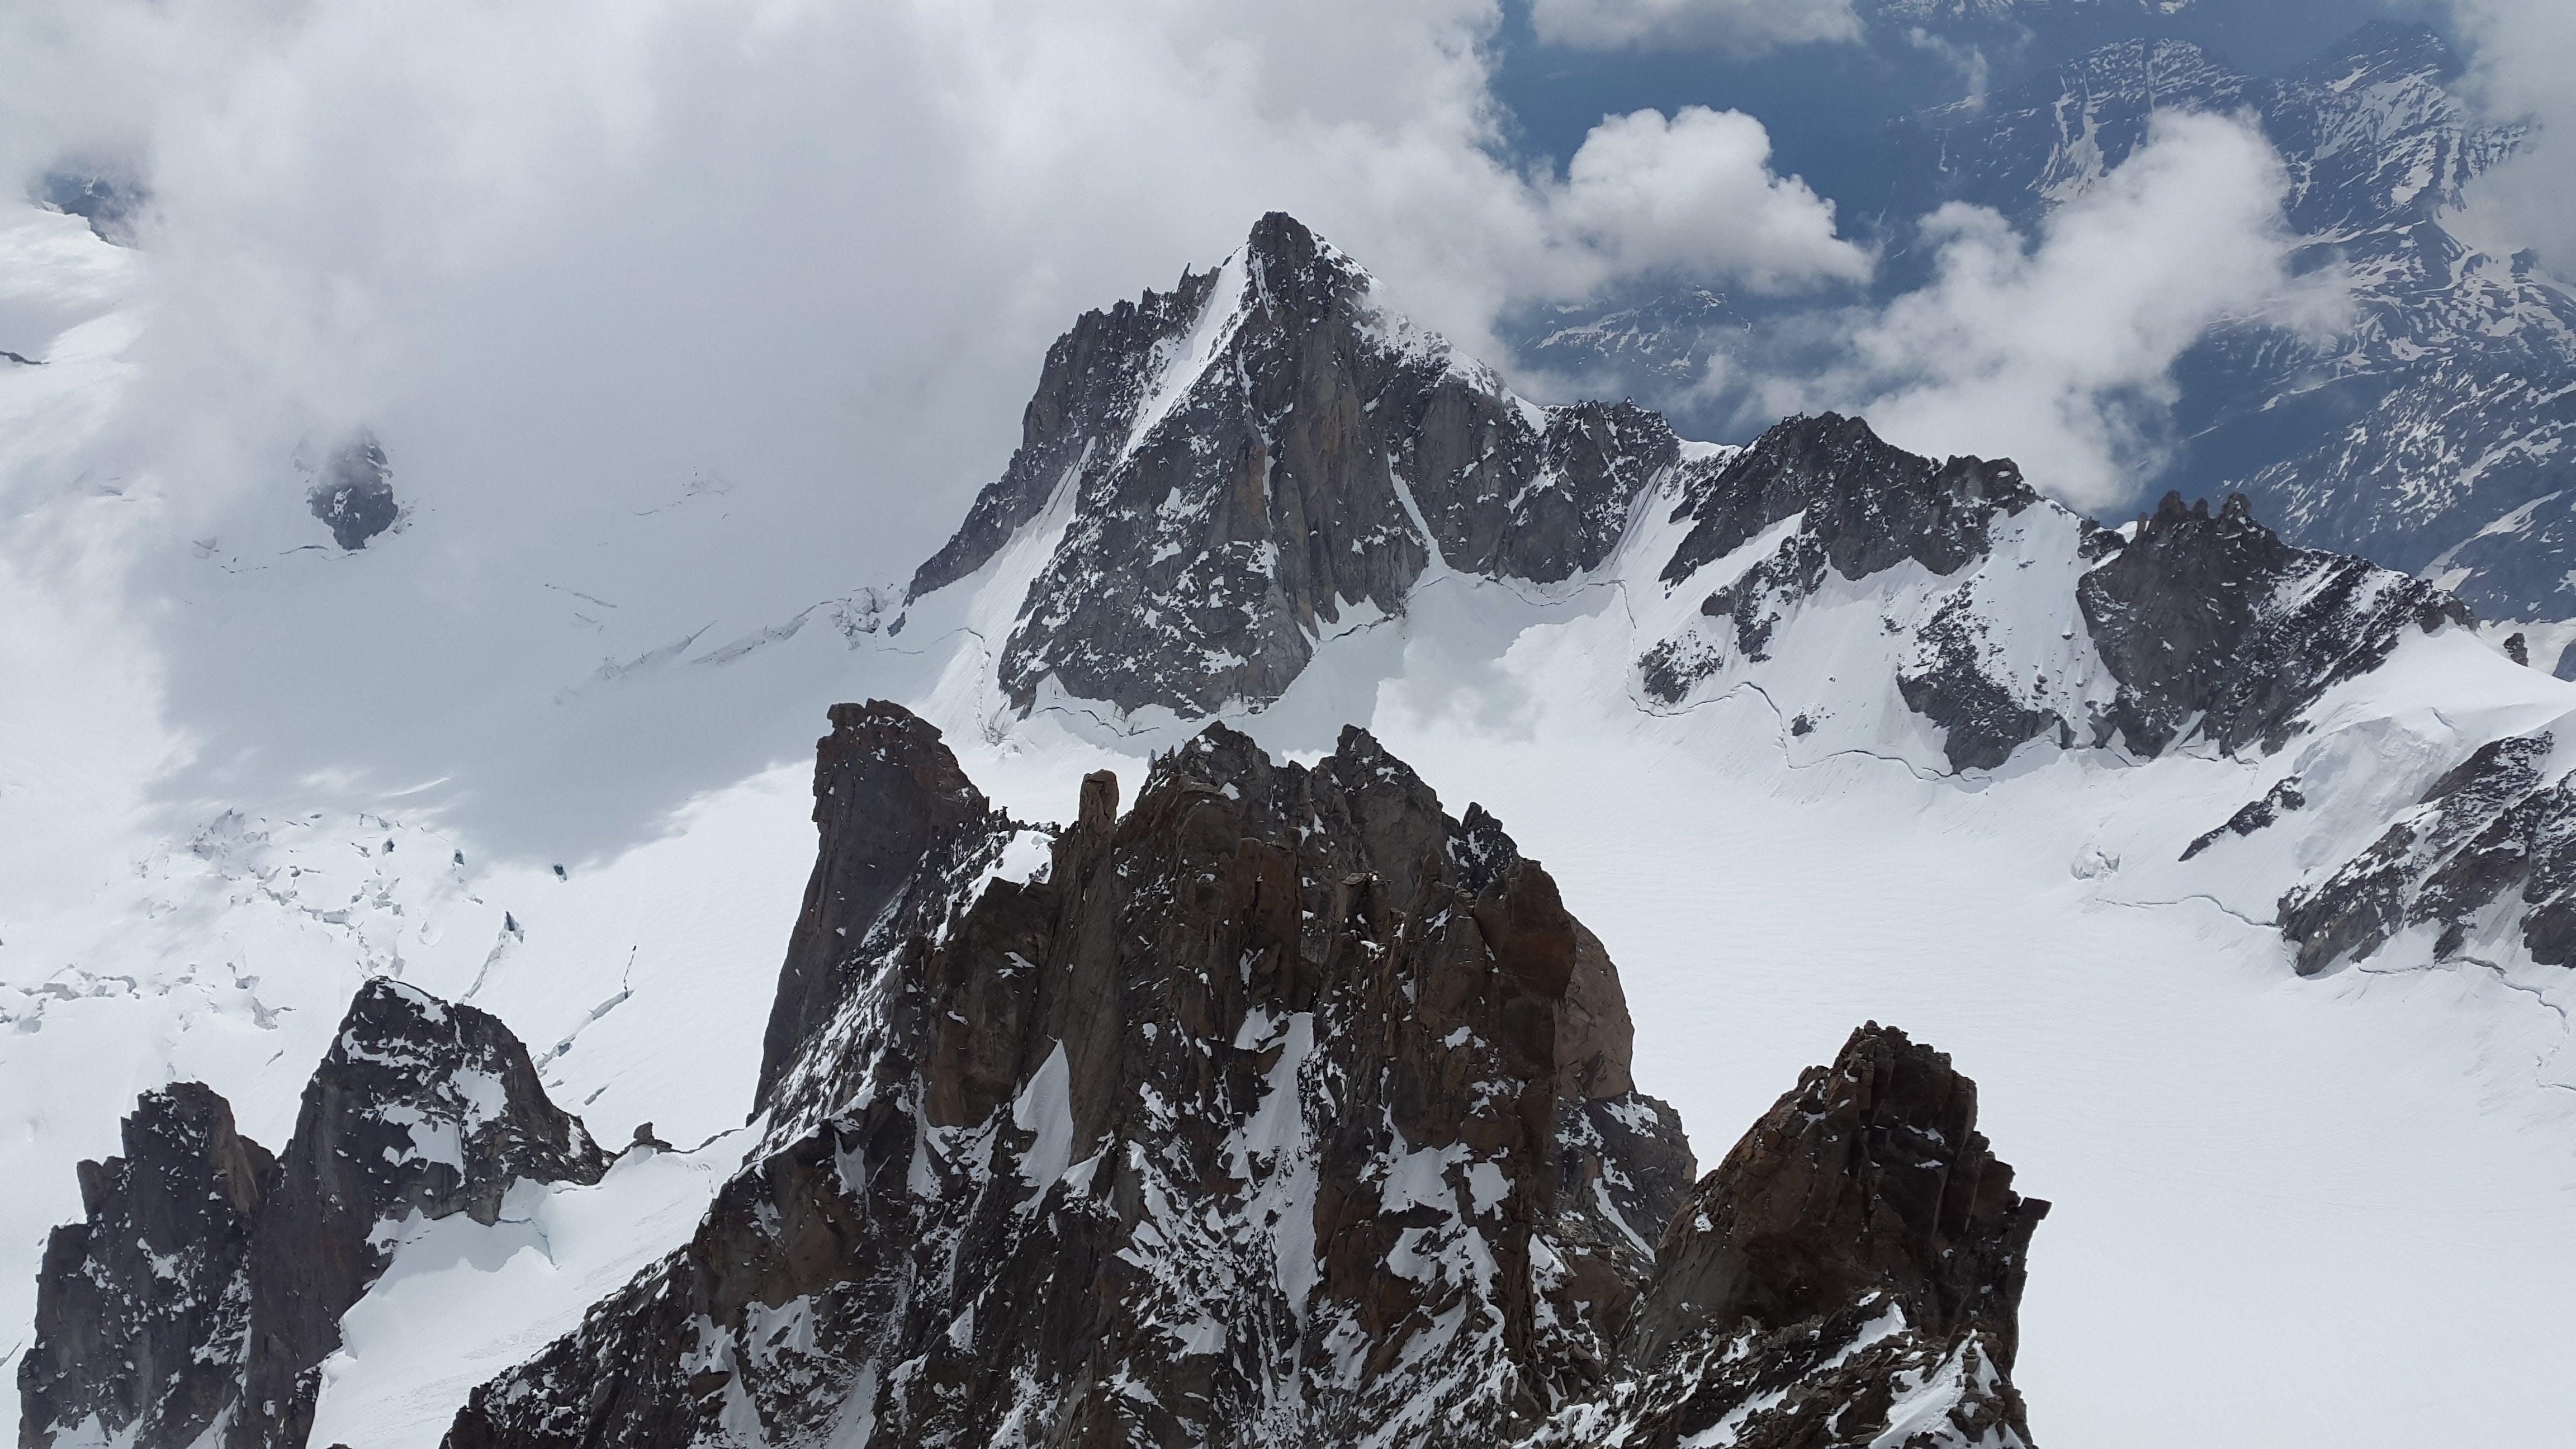 Free stock photo of cold, glacier, mountains, alpine